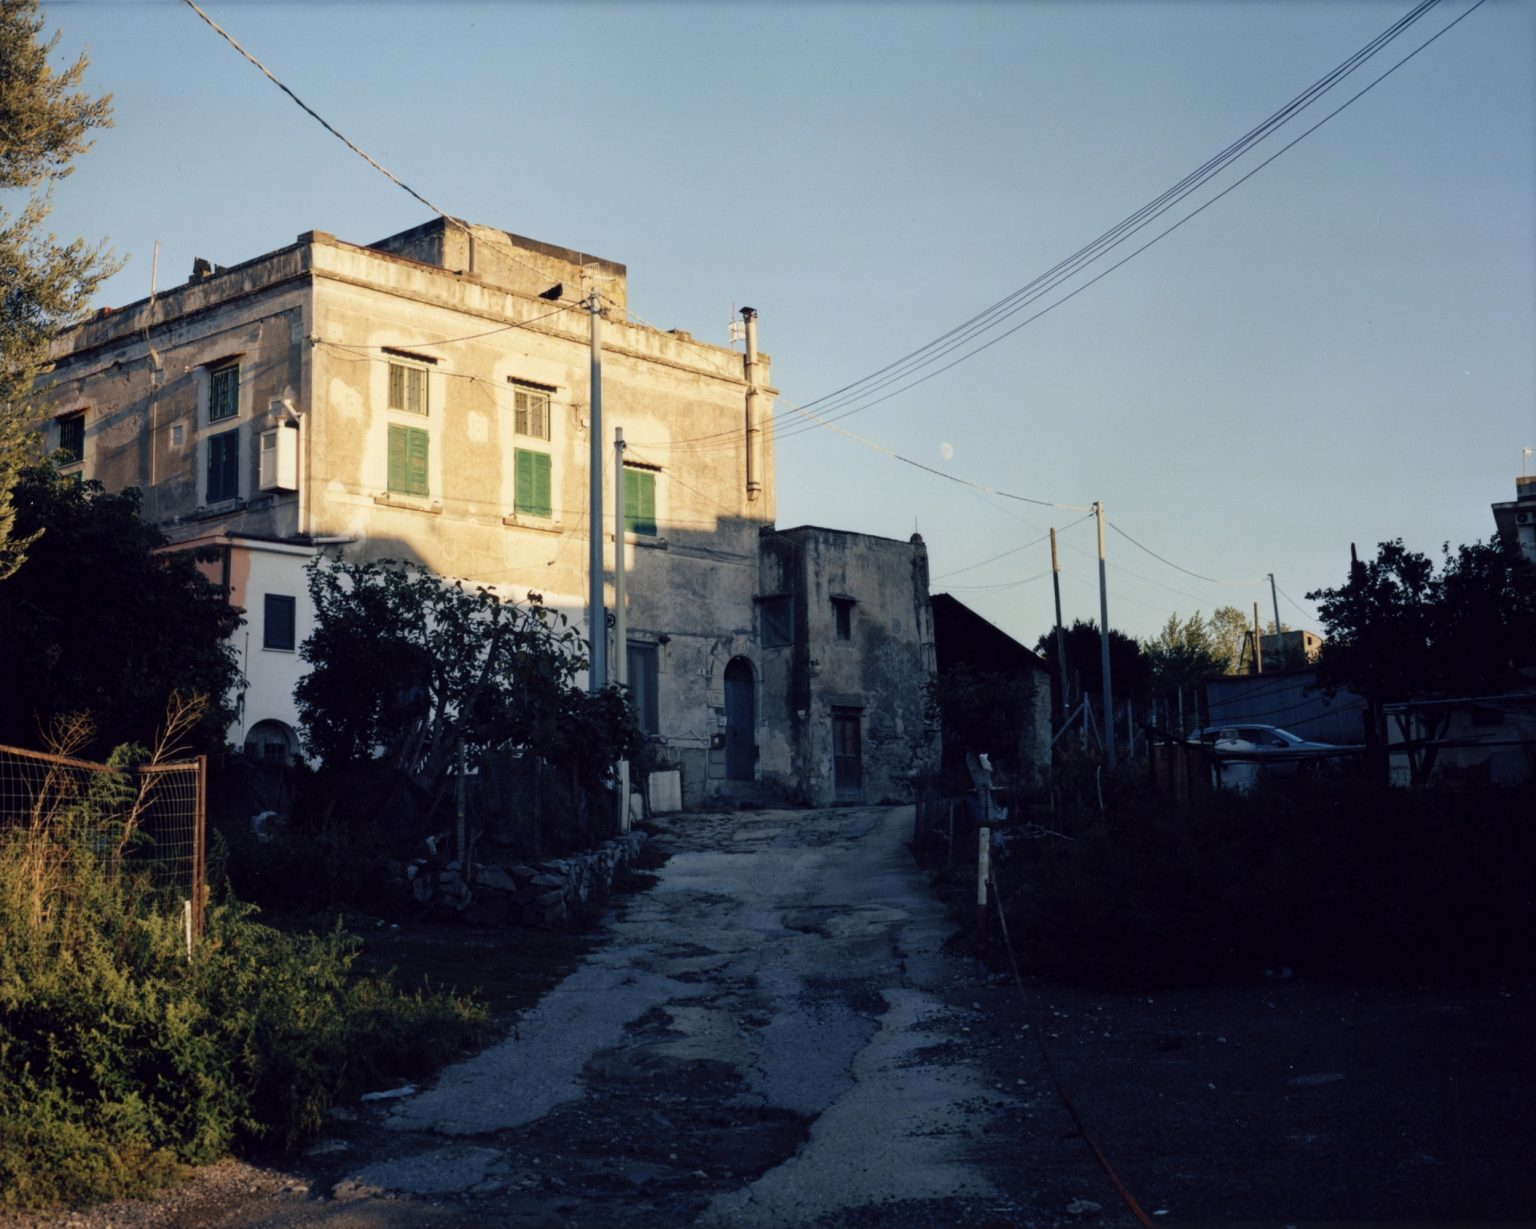 Farmhouse at the fotthills of the Vesuvius. Paesi Vesuviani, Province of Naples. 2020